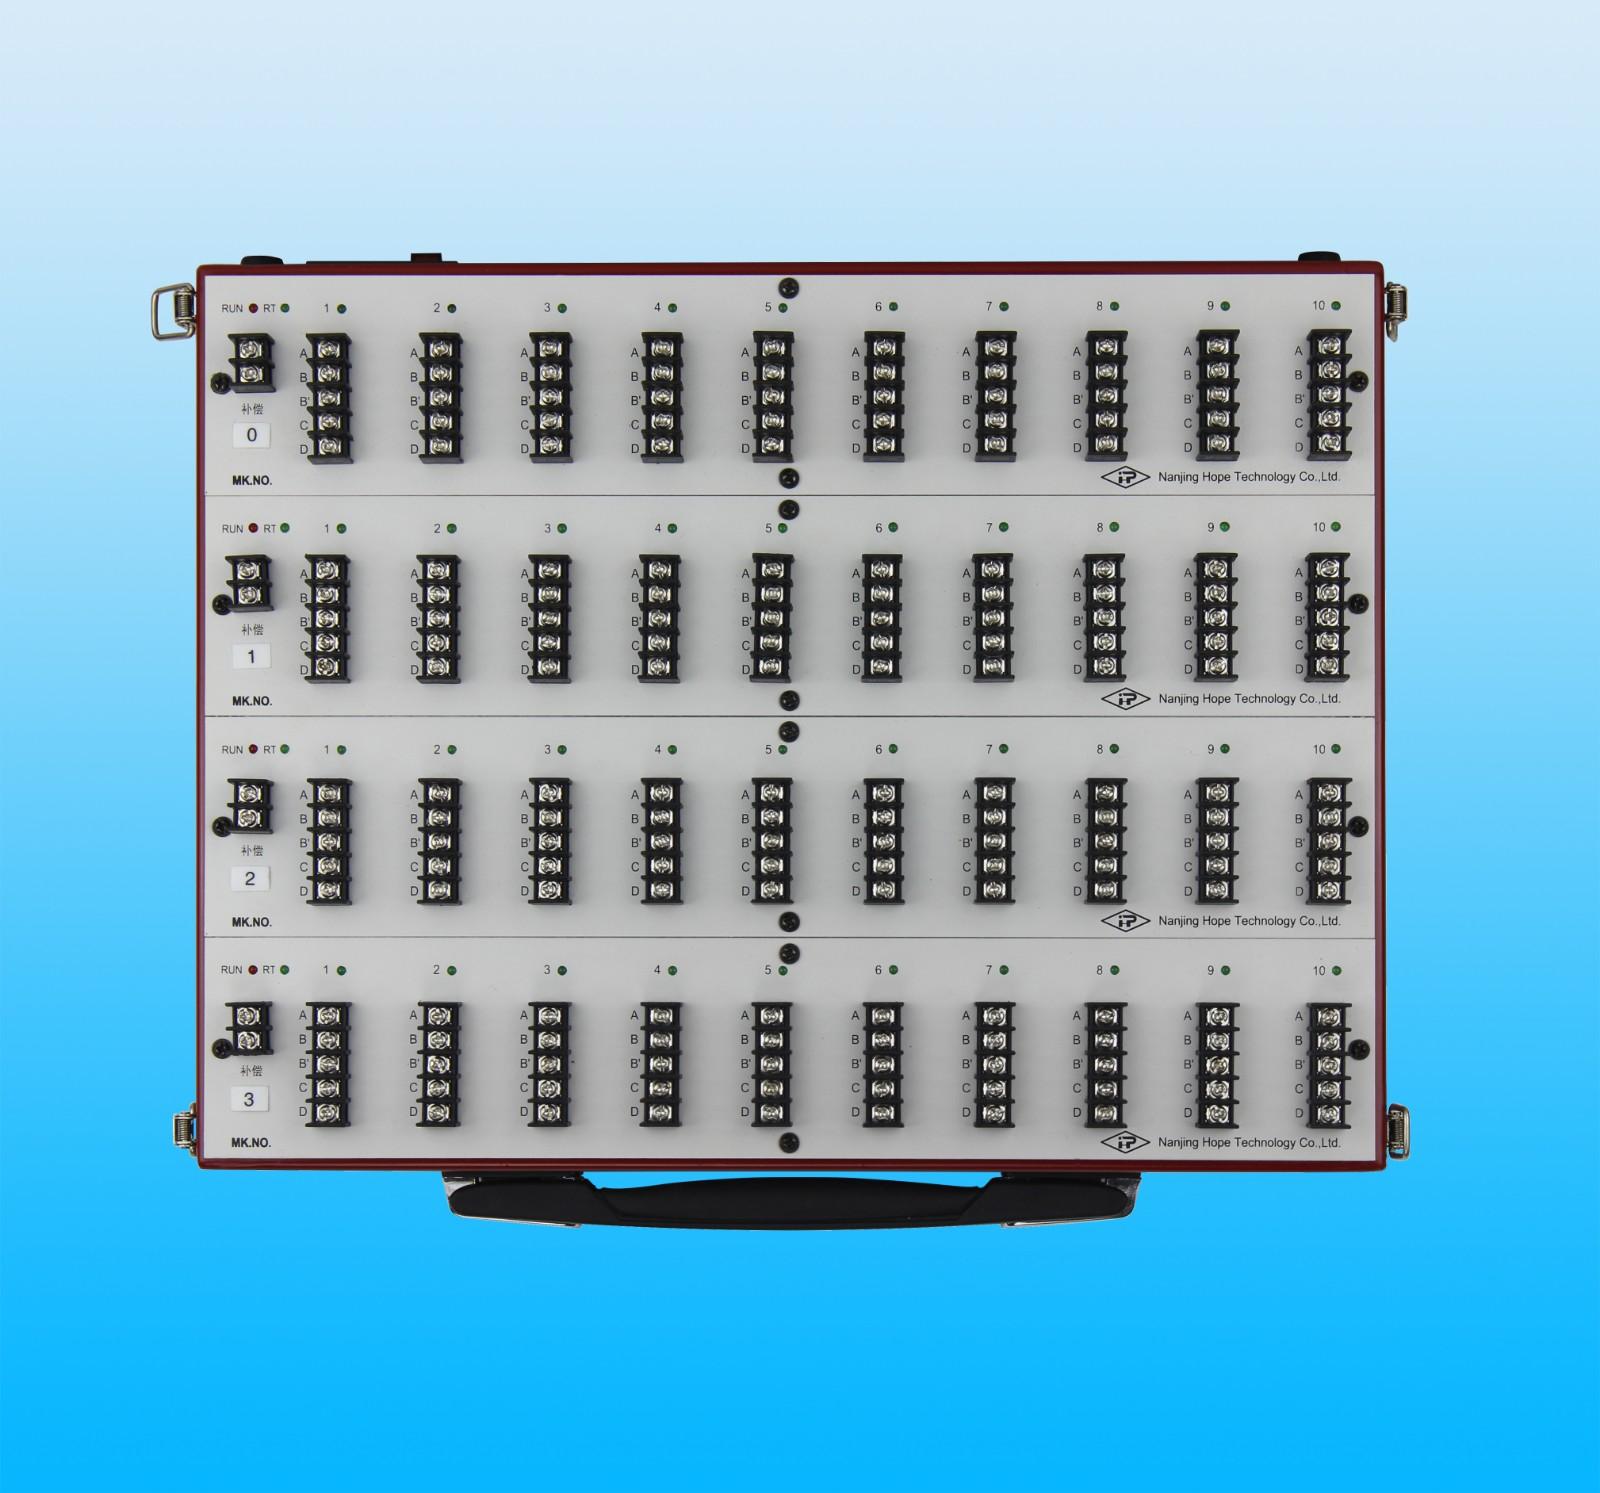 HP-JY1004静态优发国际顶级在线应变测试分析系统